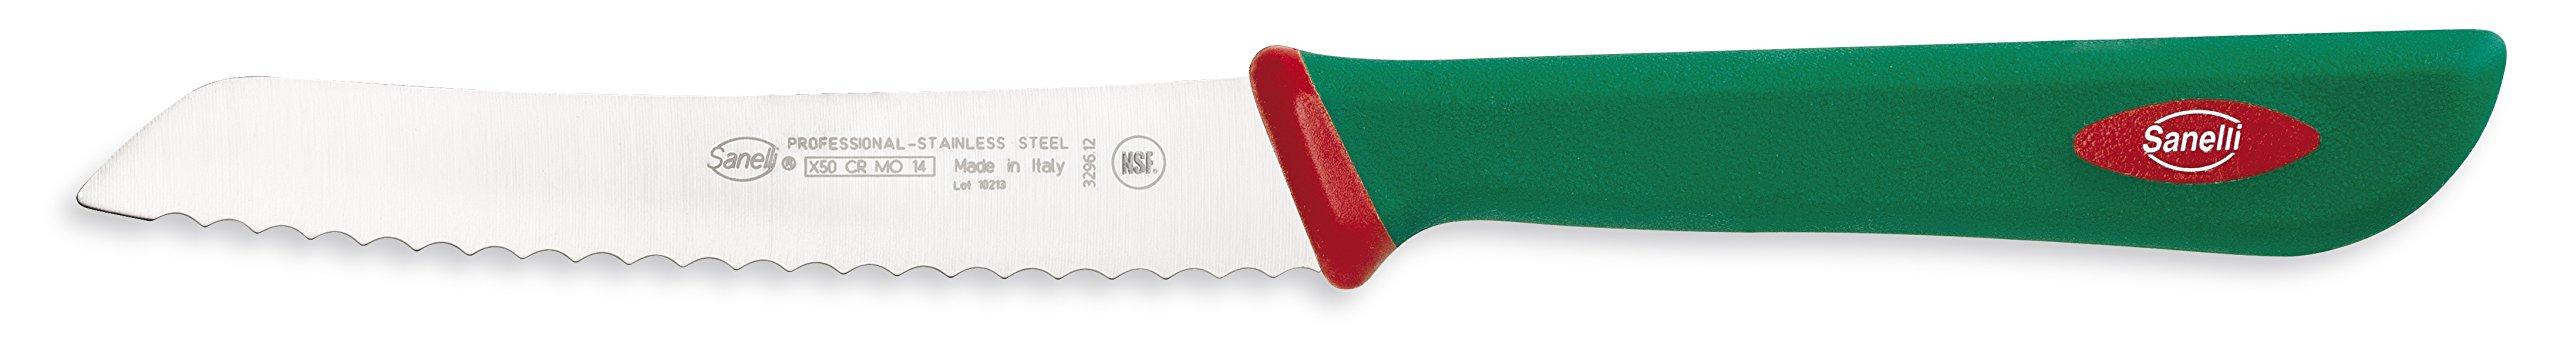 Sanelli Premana Professional Tomato Knife, 12cm/4.72'', Green